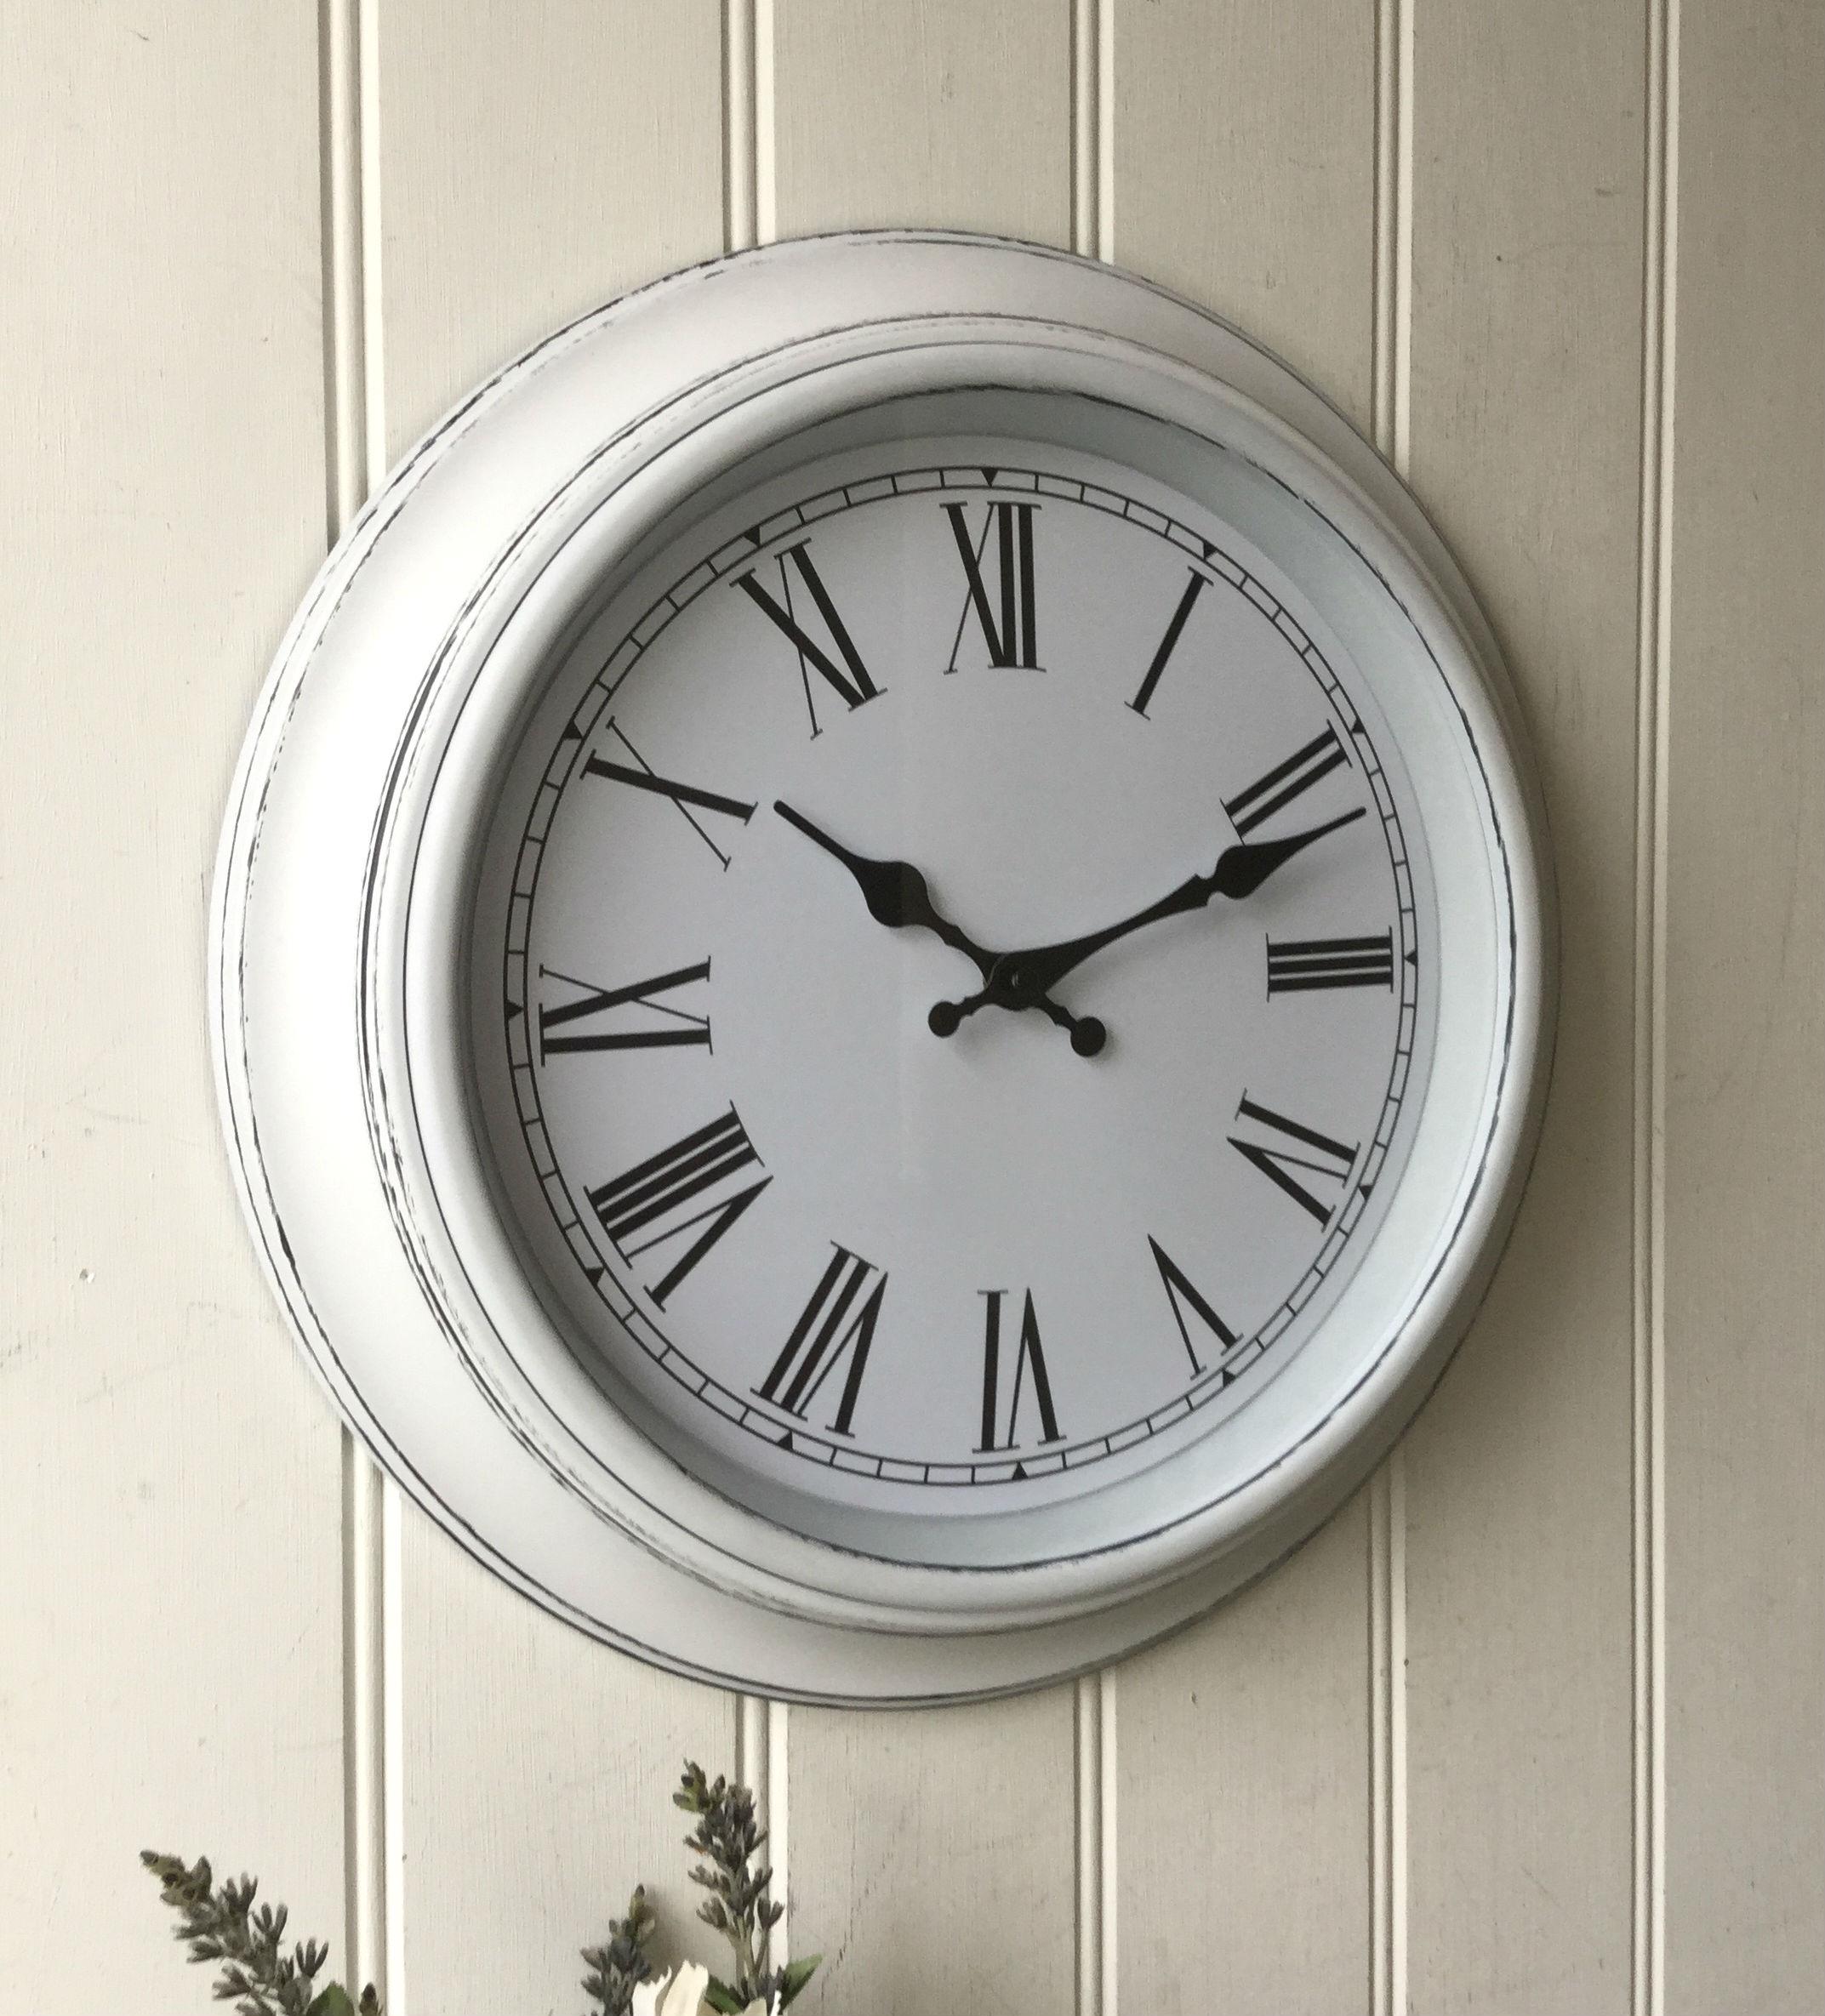 Shabby Chic Large White Wall Clock – Amazing Grace Interiors